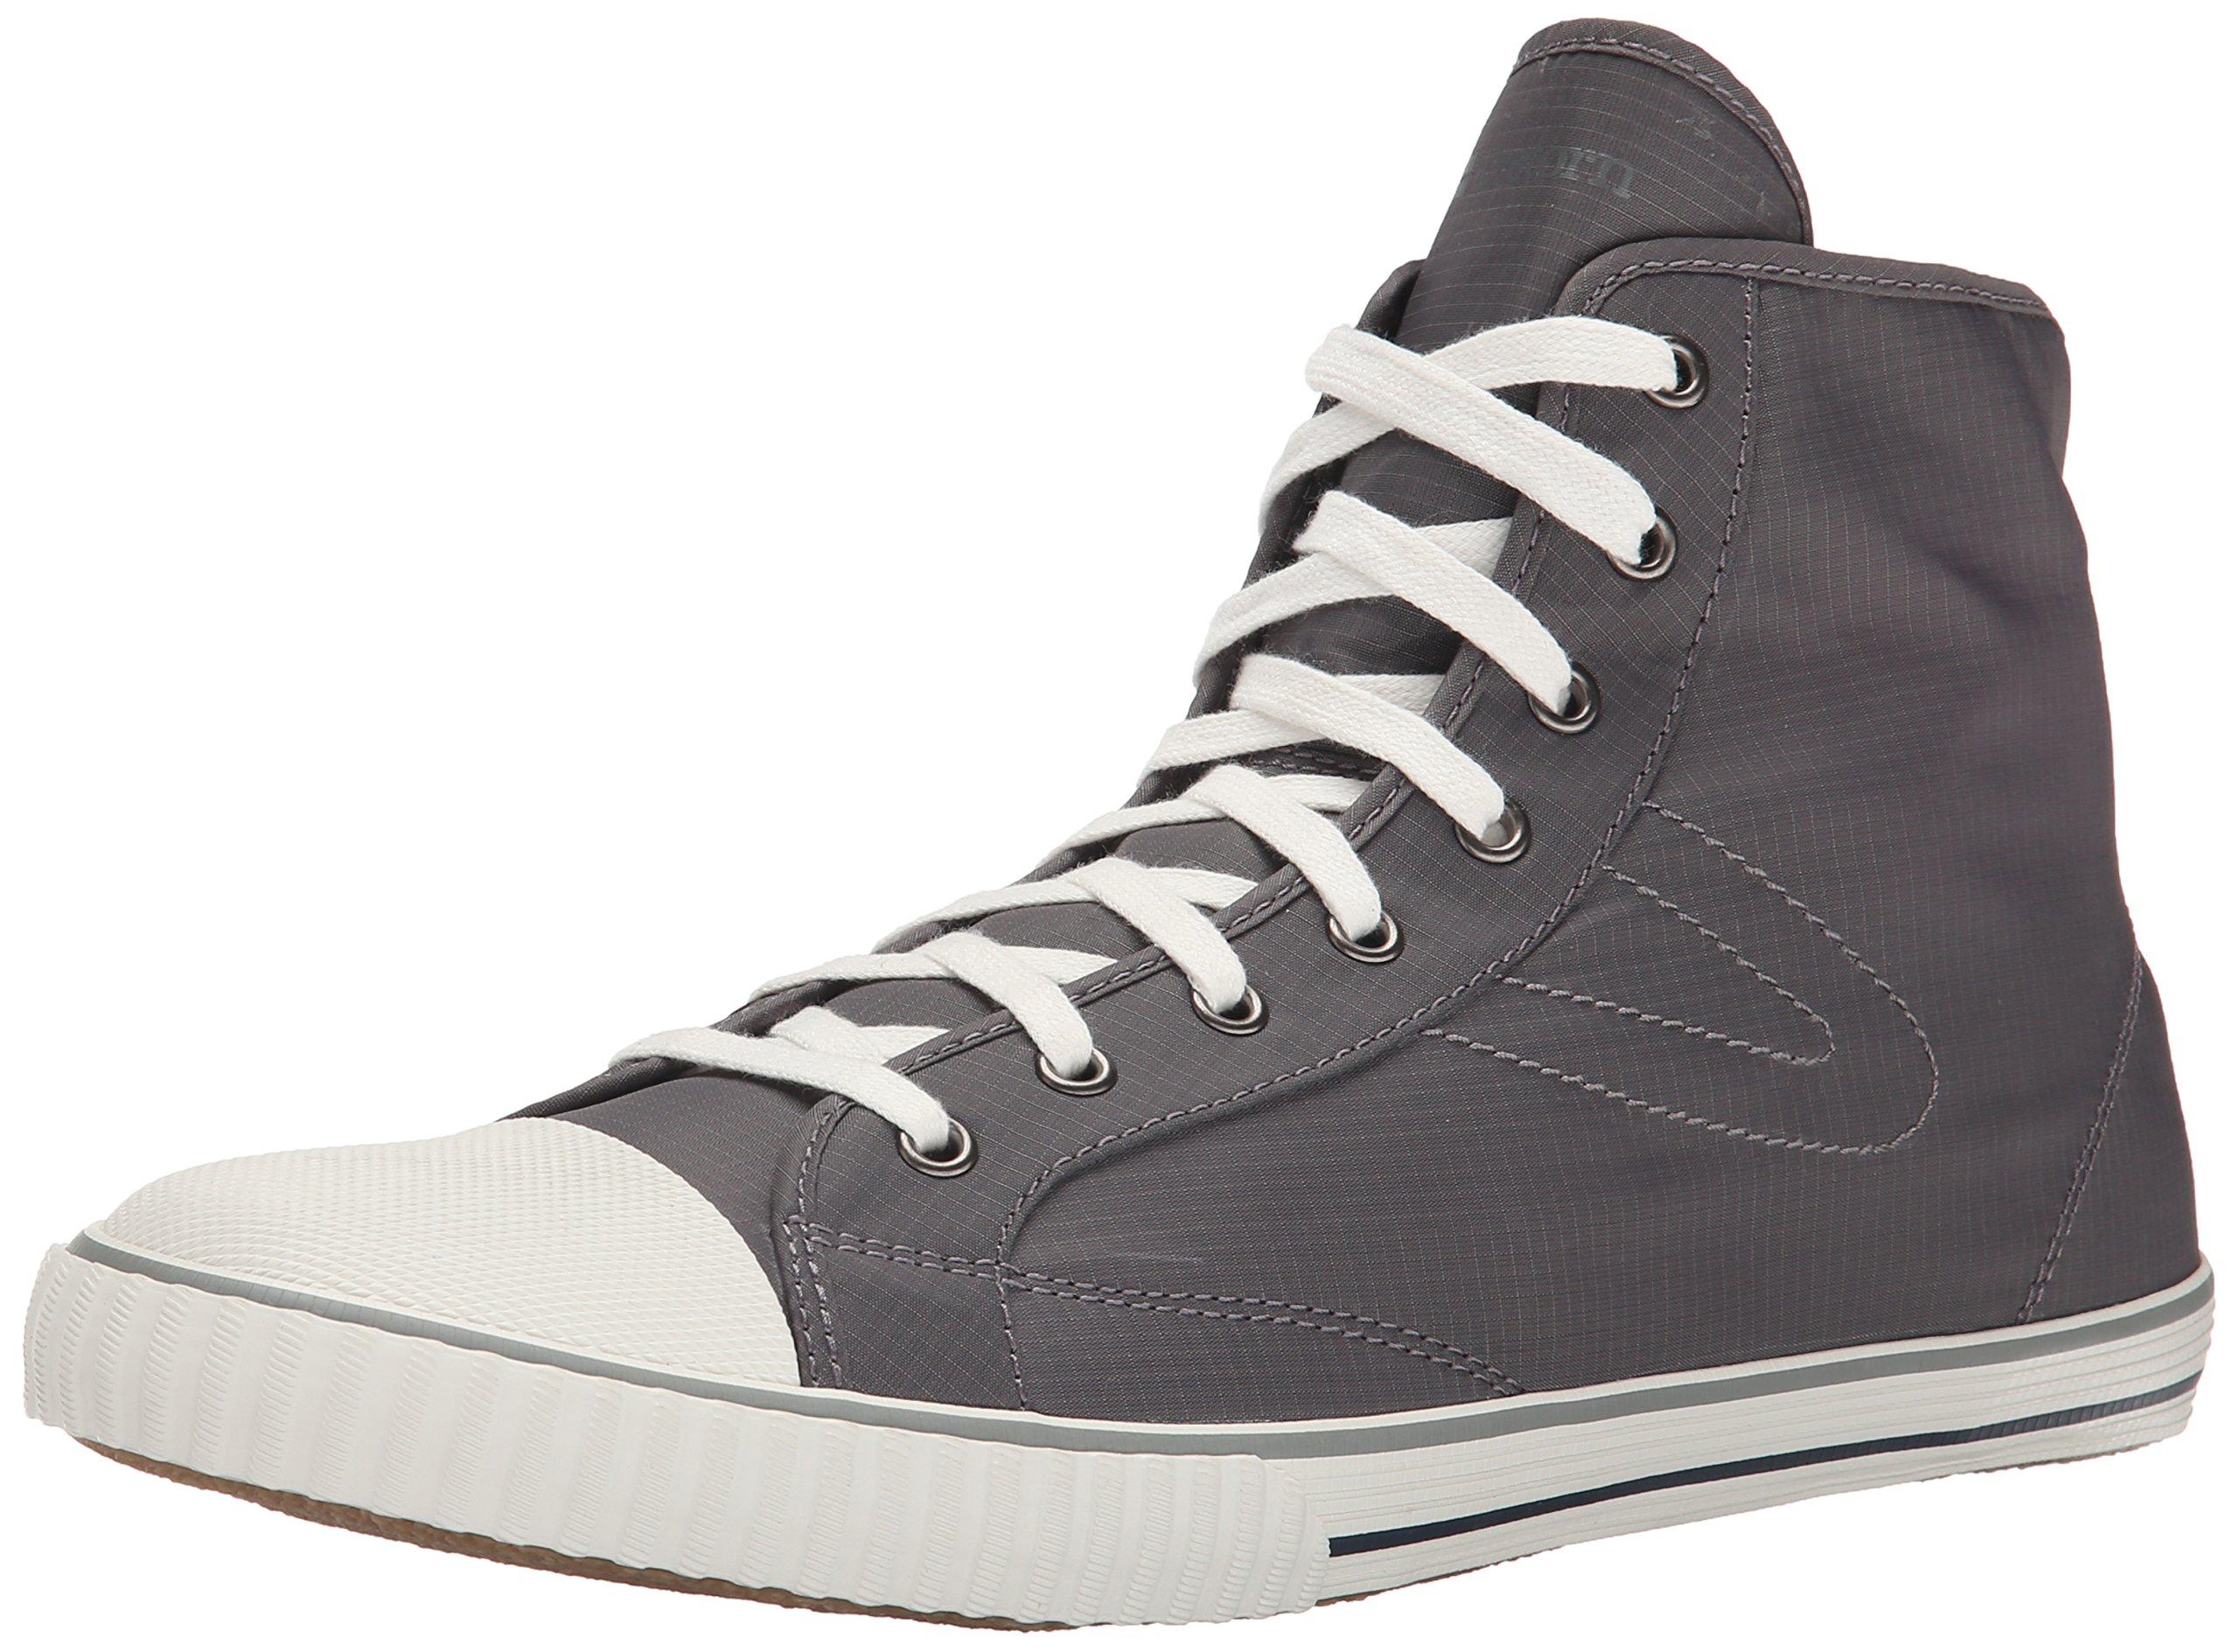 Tretorn Men's Hockey Boot Rip-Stop Fashion Sneaker, Charcoal Grey, 12 D US